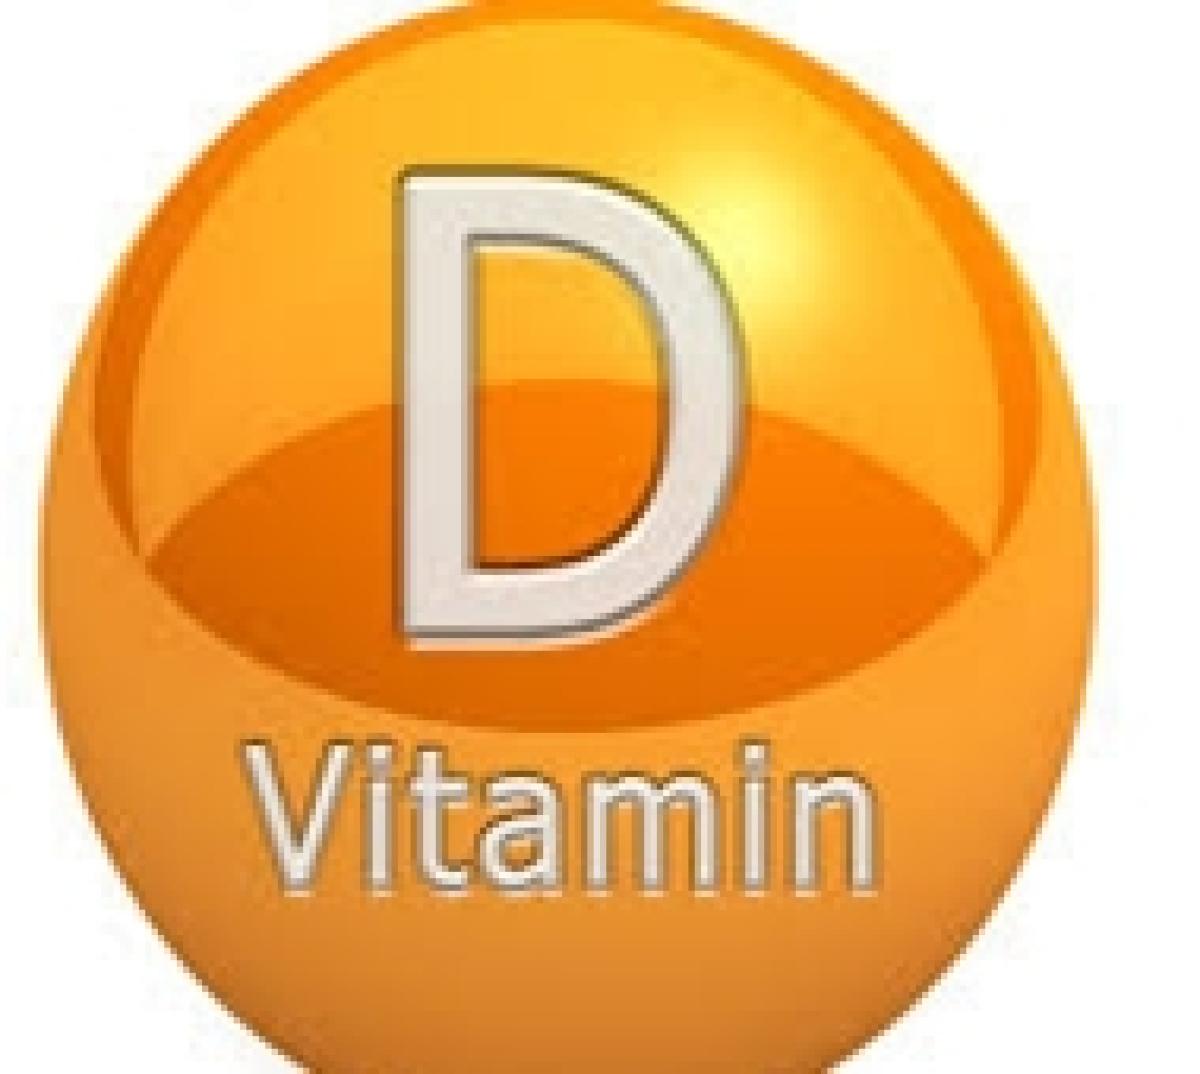 Vitamin D may help cut body fat in infants